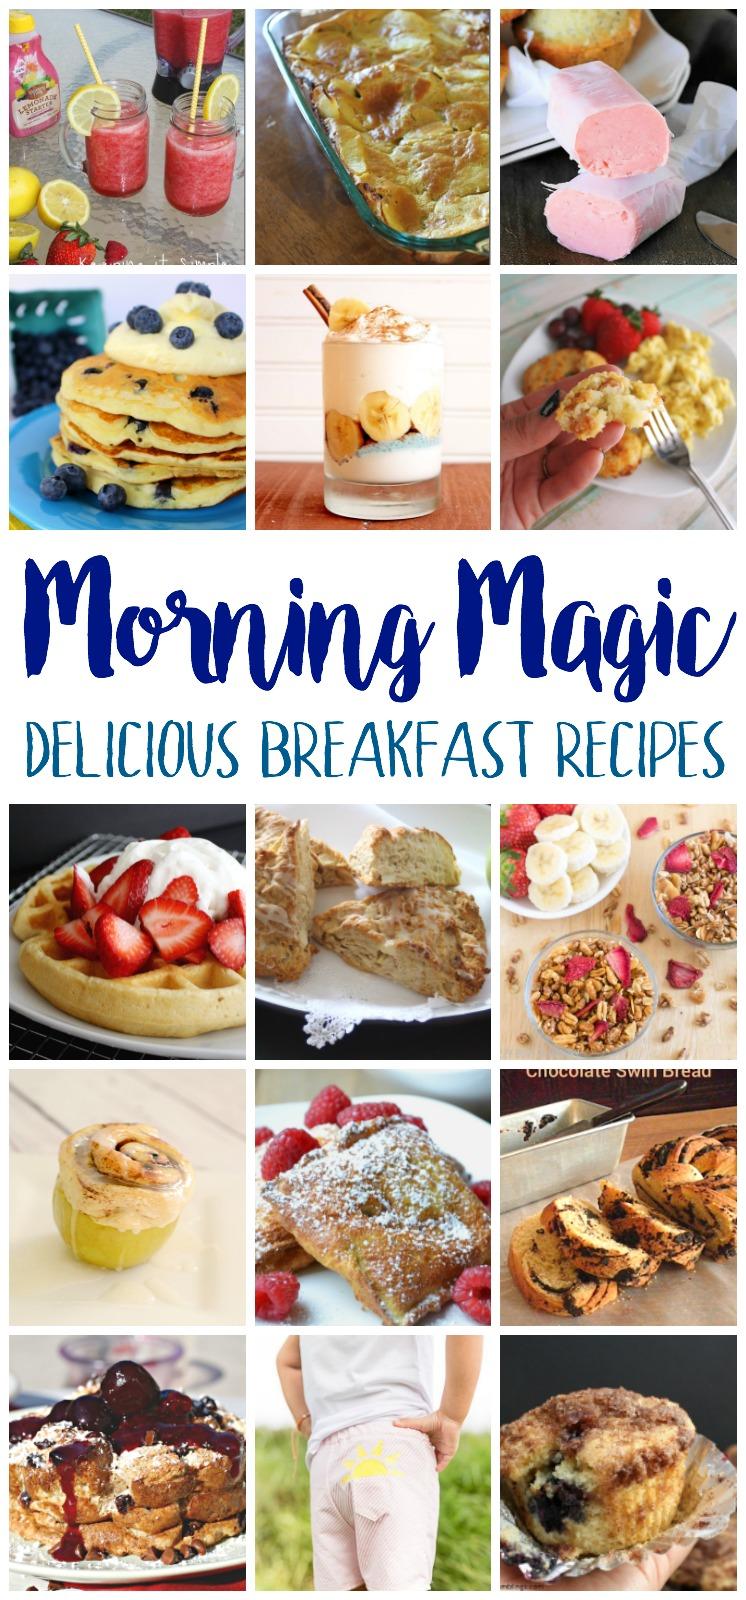 tons of delicious breakfast recipe ideas